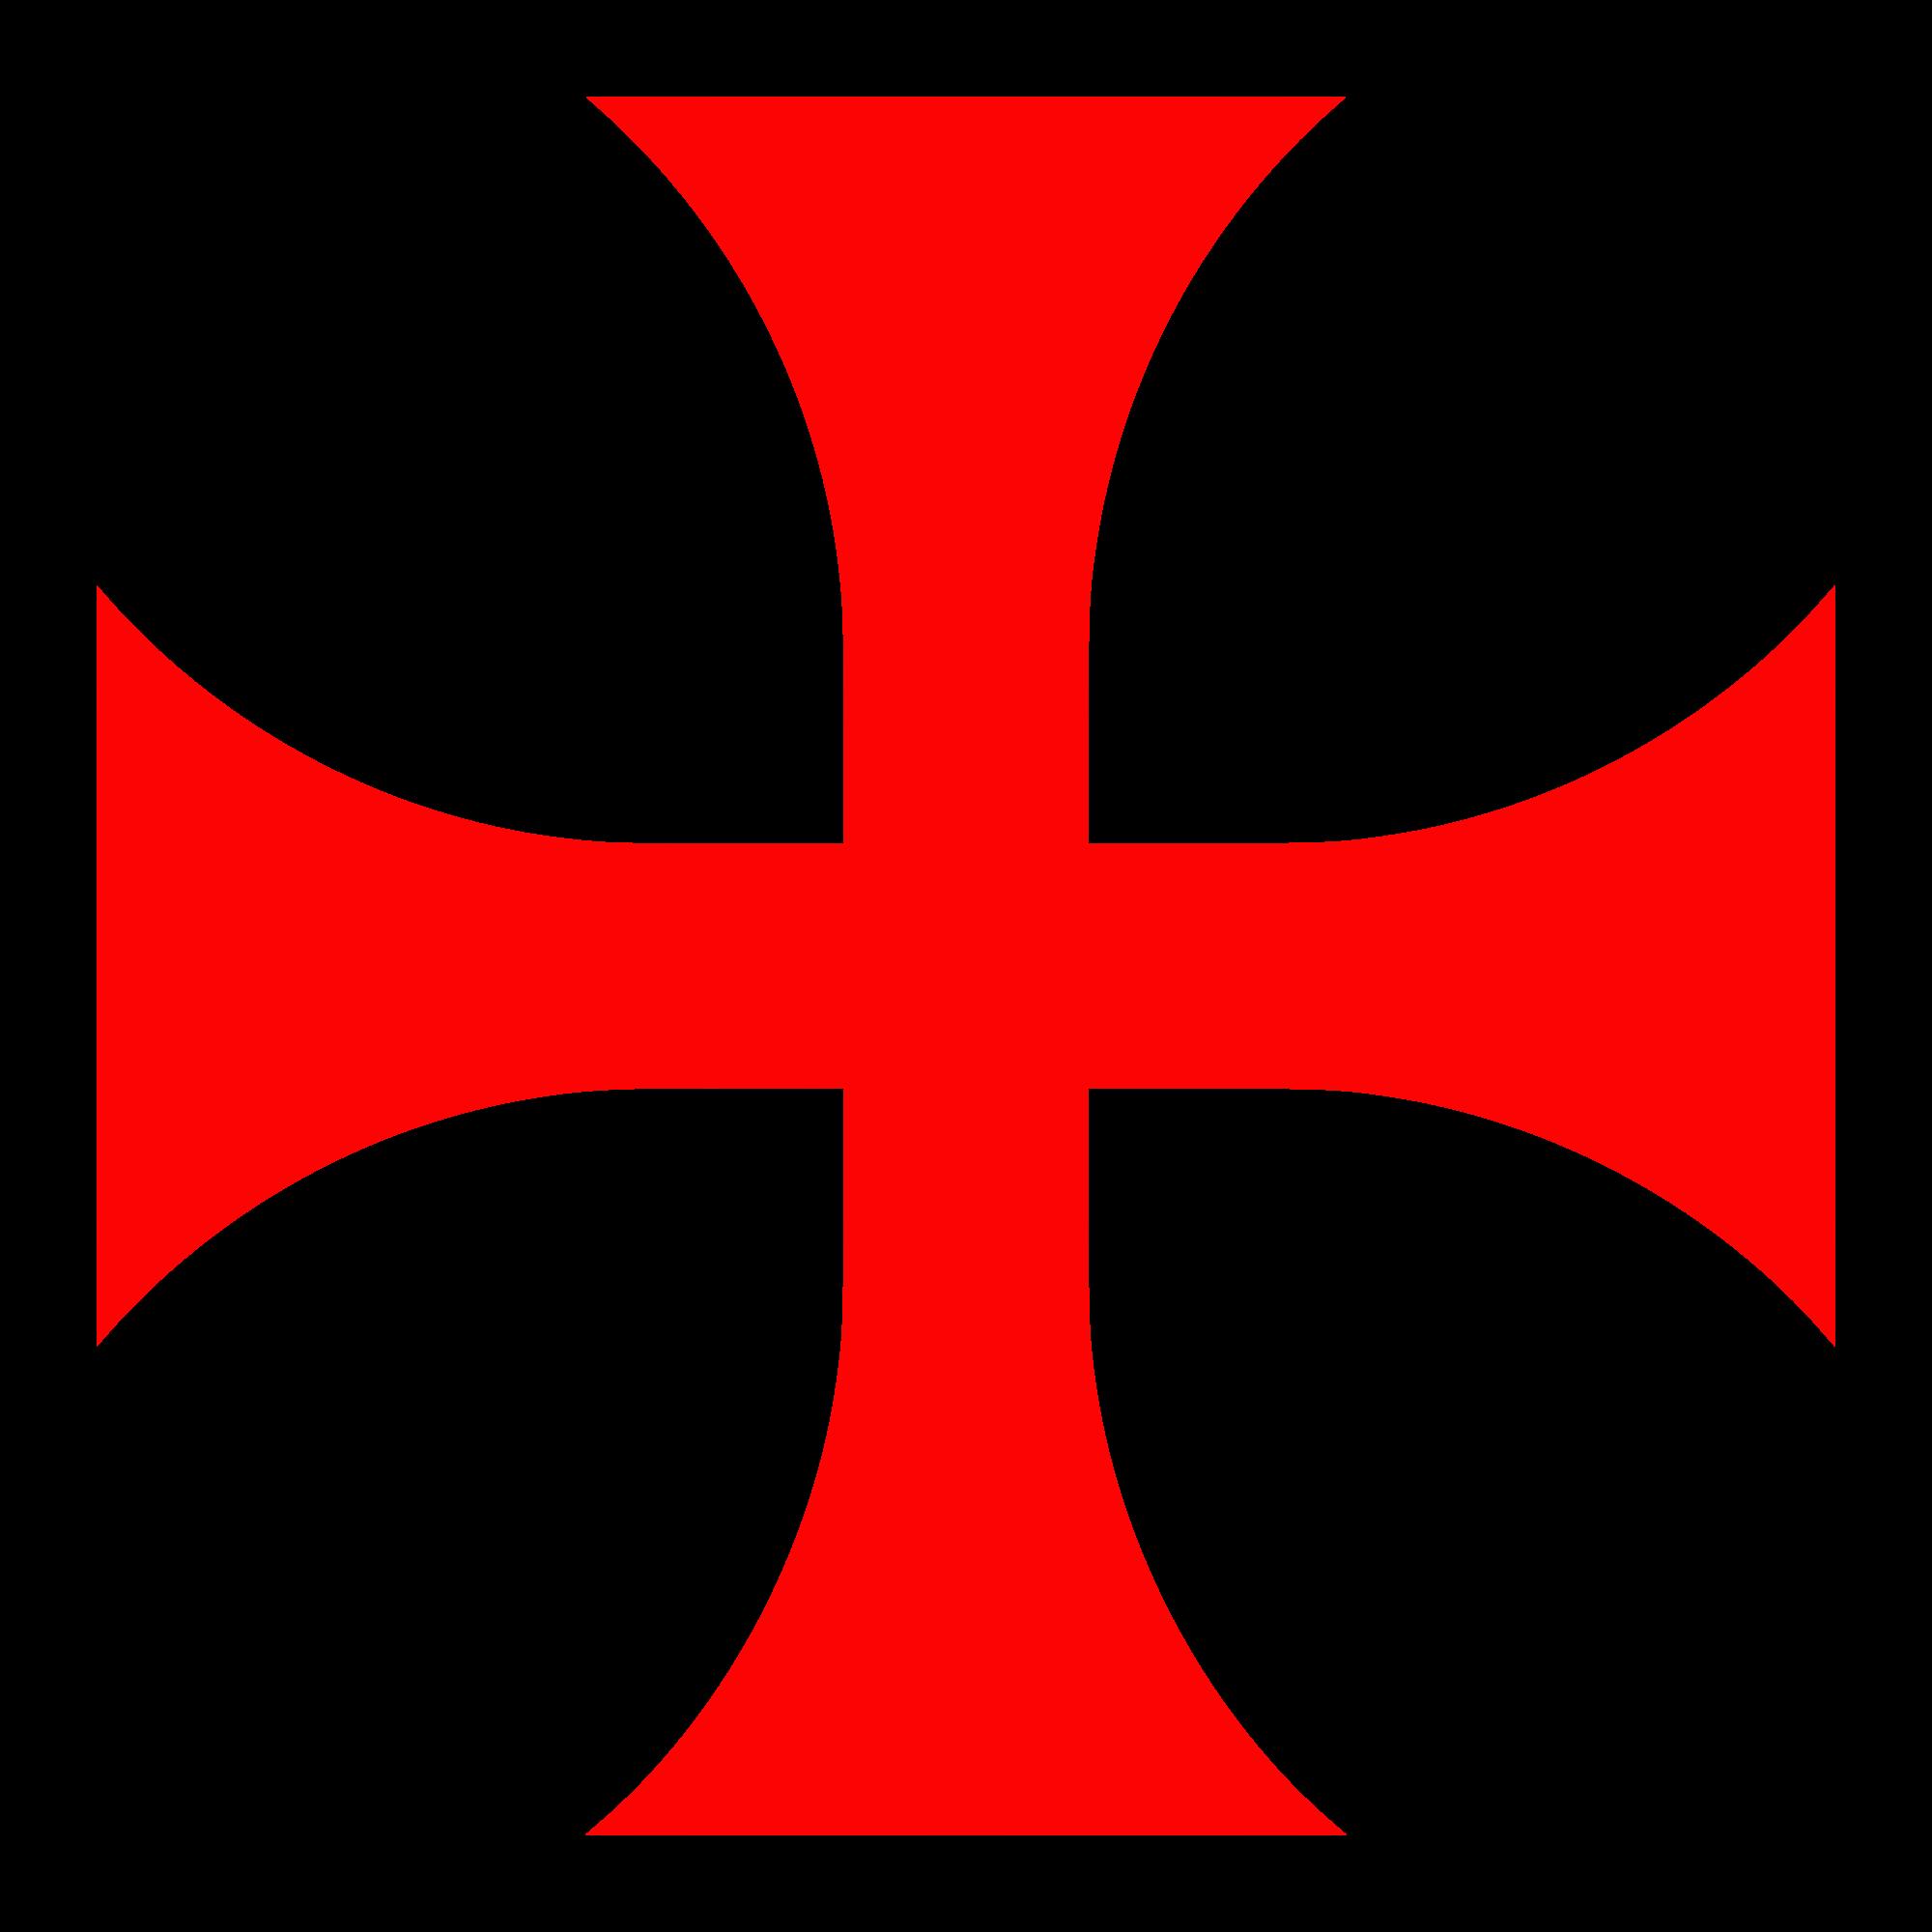 Templars Assassins Creed Wiki Fandom Powered By Wikia